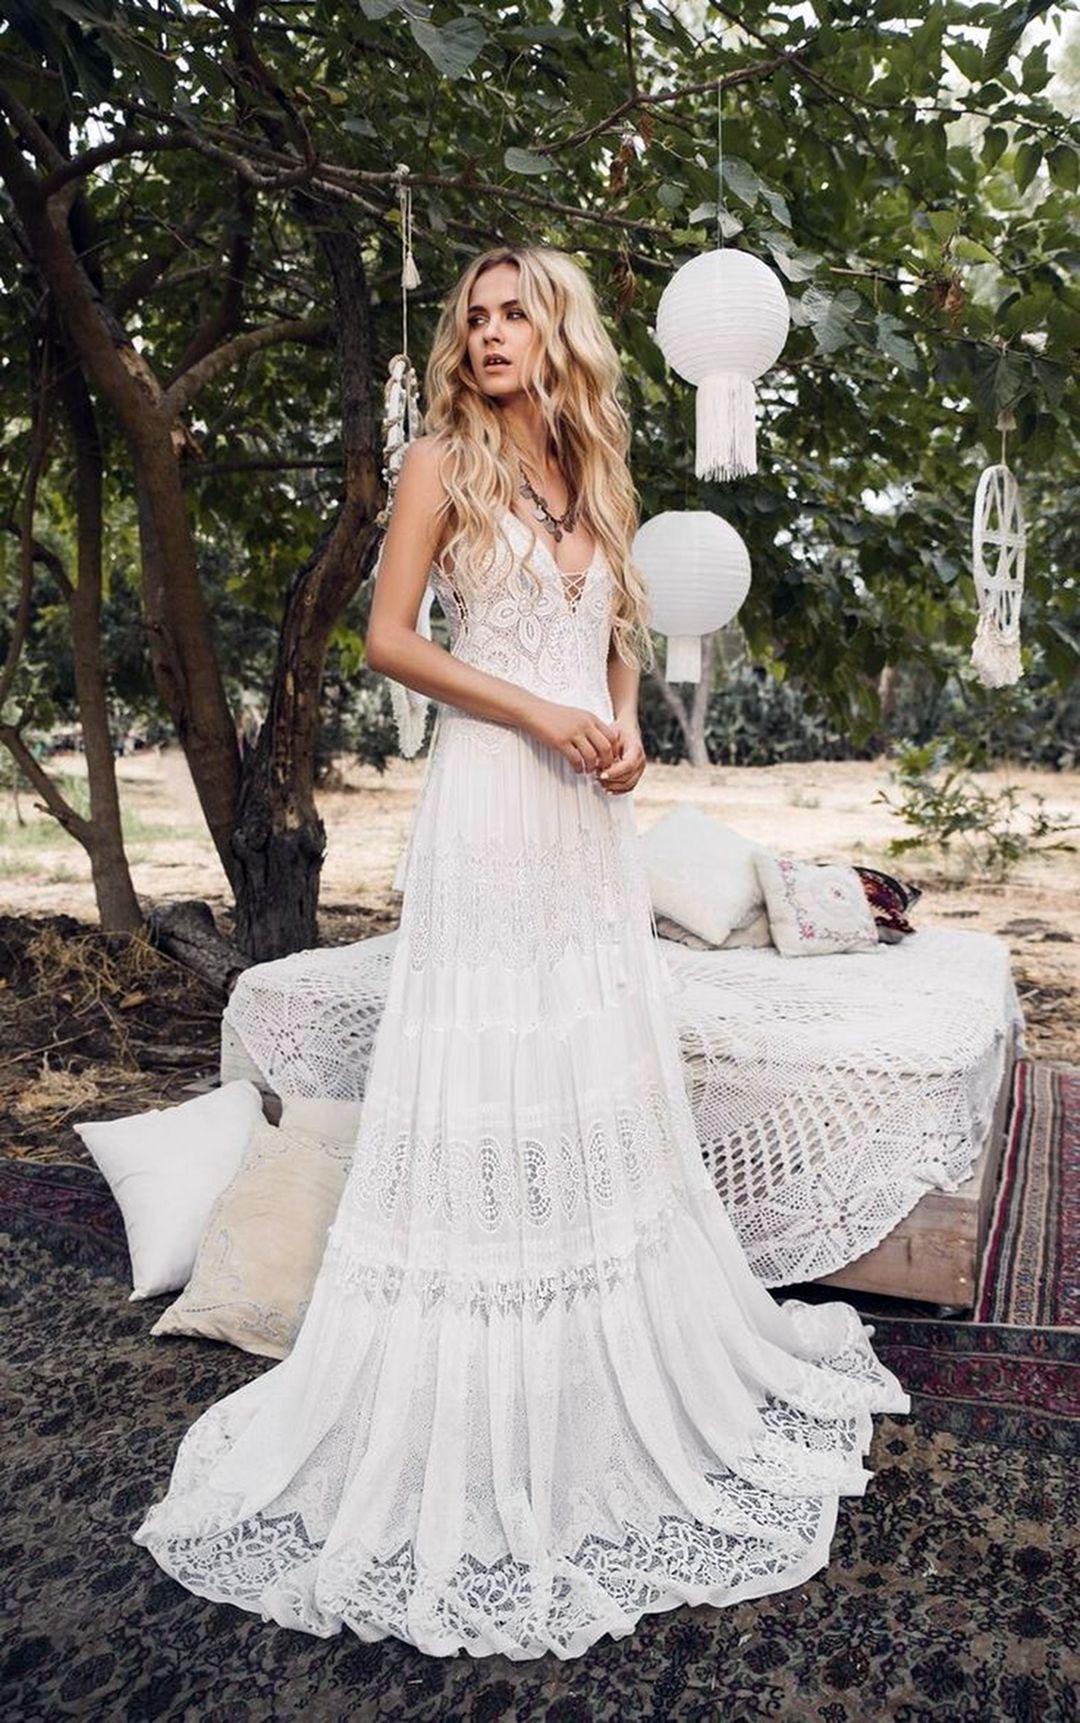 13 Pretty Bohemian Wedding Dresses Models For Your Summer Wedding Inspiration Wedding Dresses Vintage Bohemian Boho Wedding Dress Lace Bohemian Wedding Dresses [ 1723 x 1080 Pixel ]